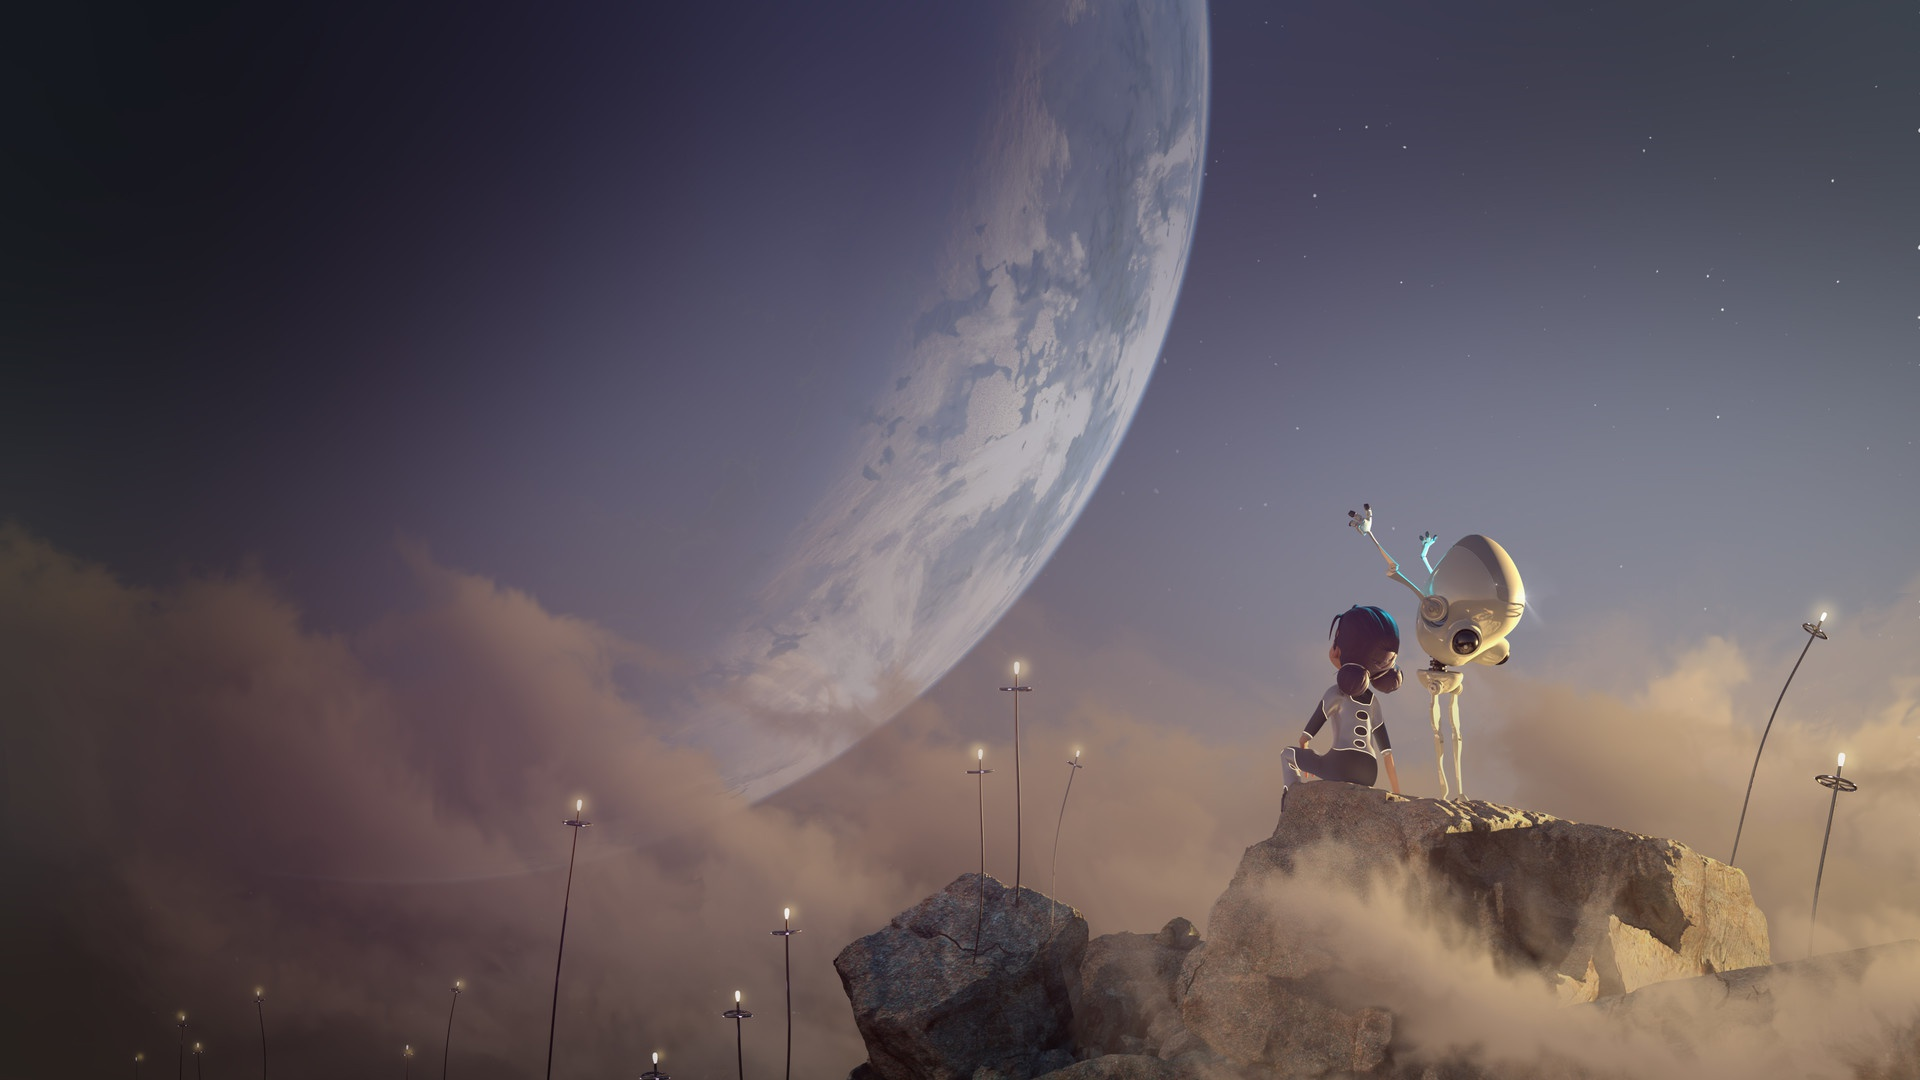 Planet Child Little Girl 1920x1080